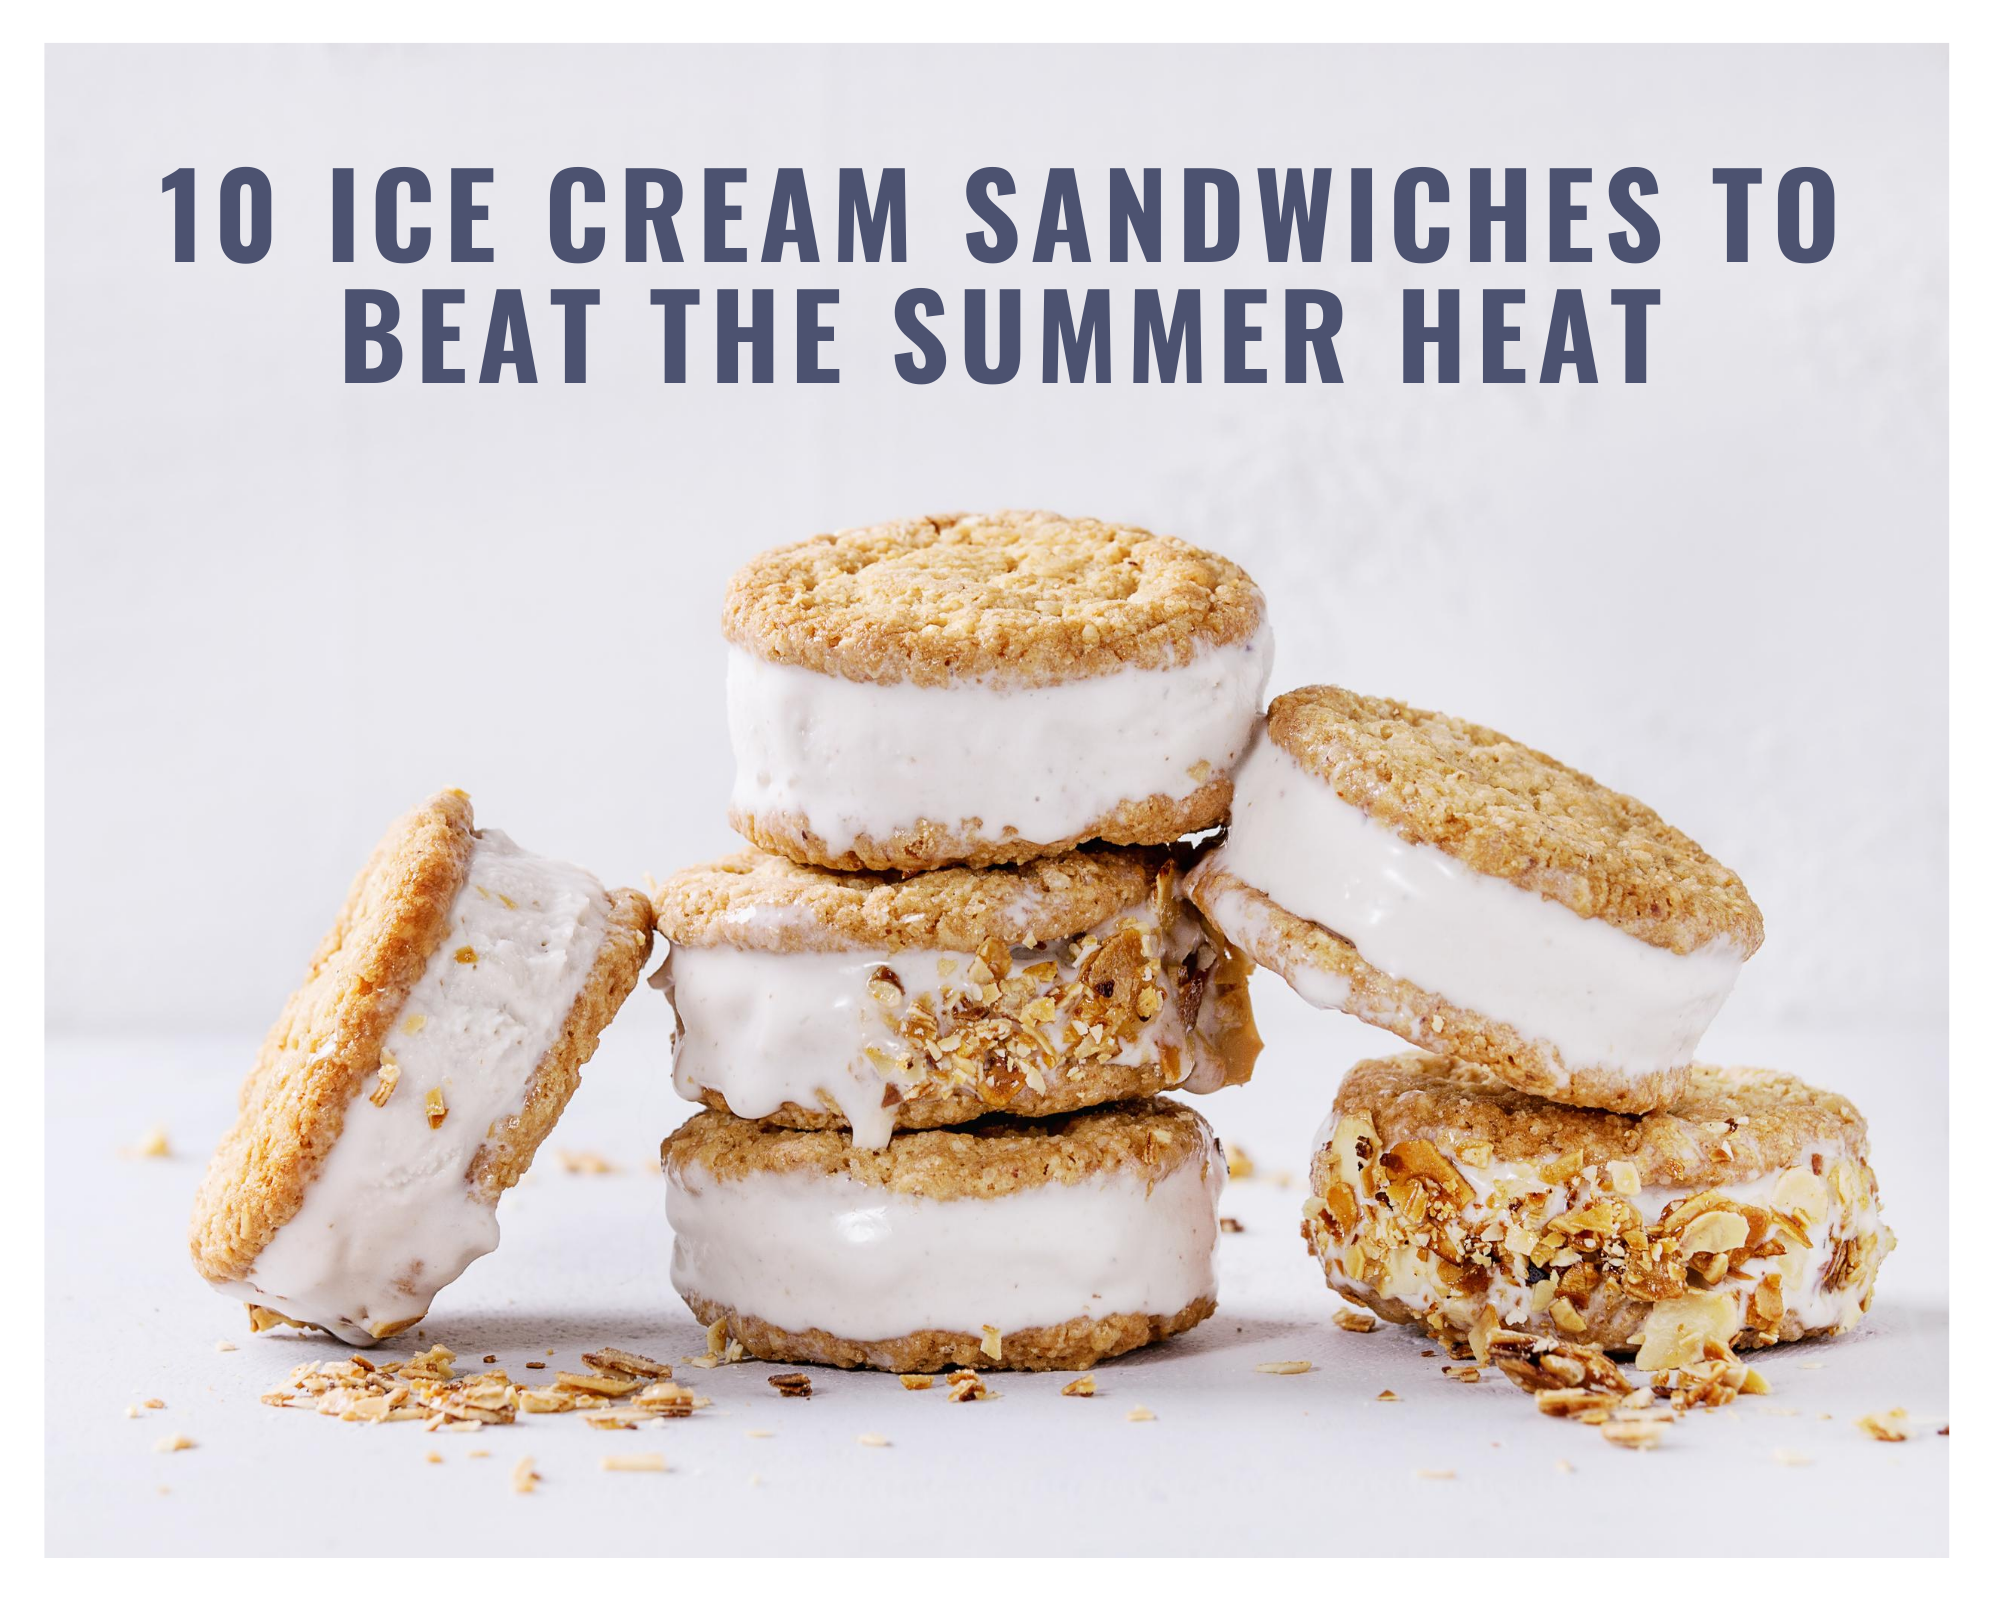 oatmeal ice cream sandwiches